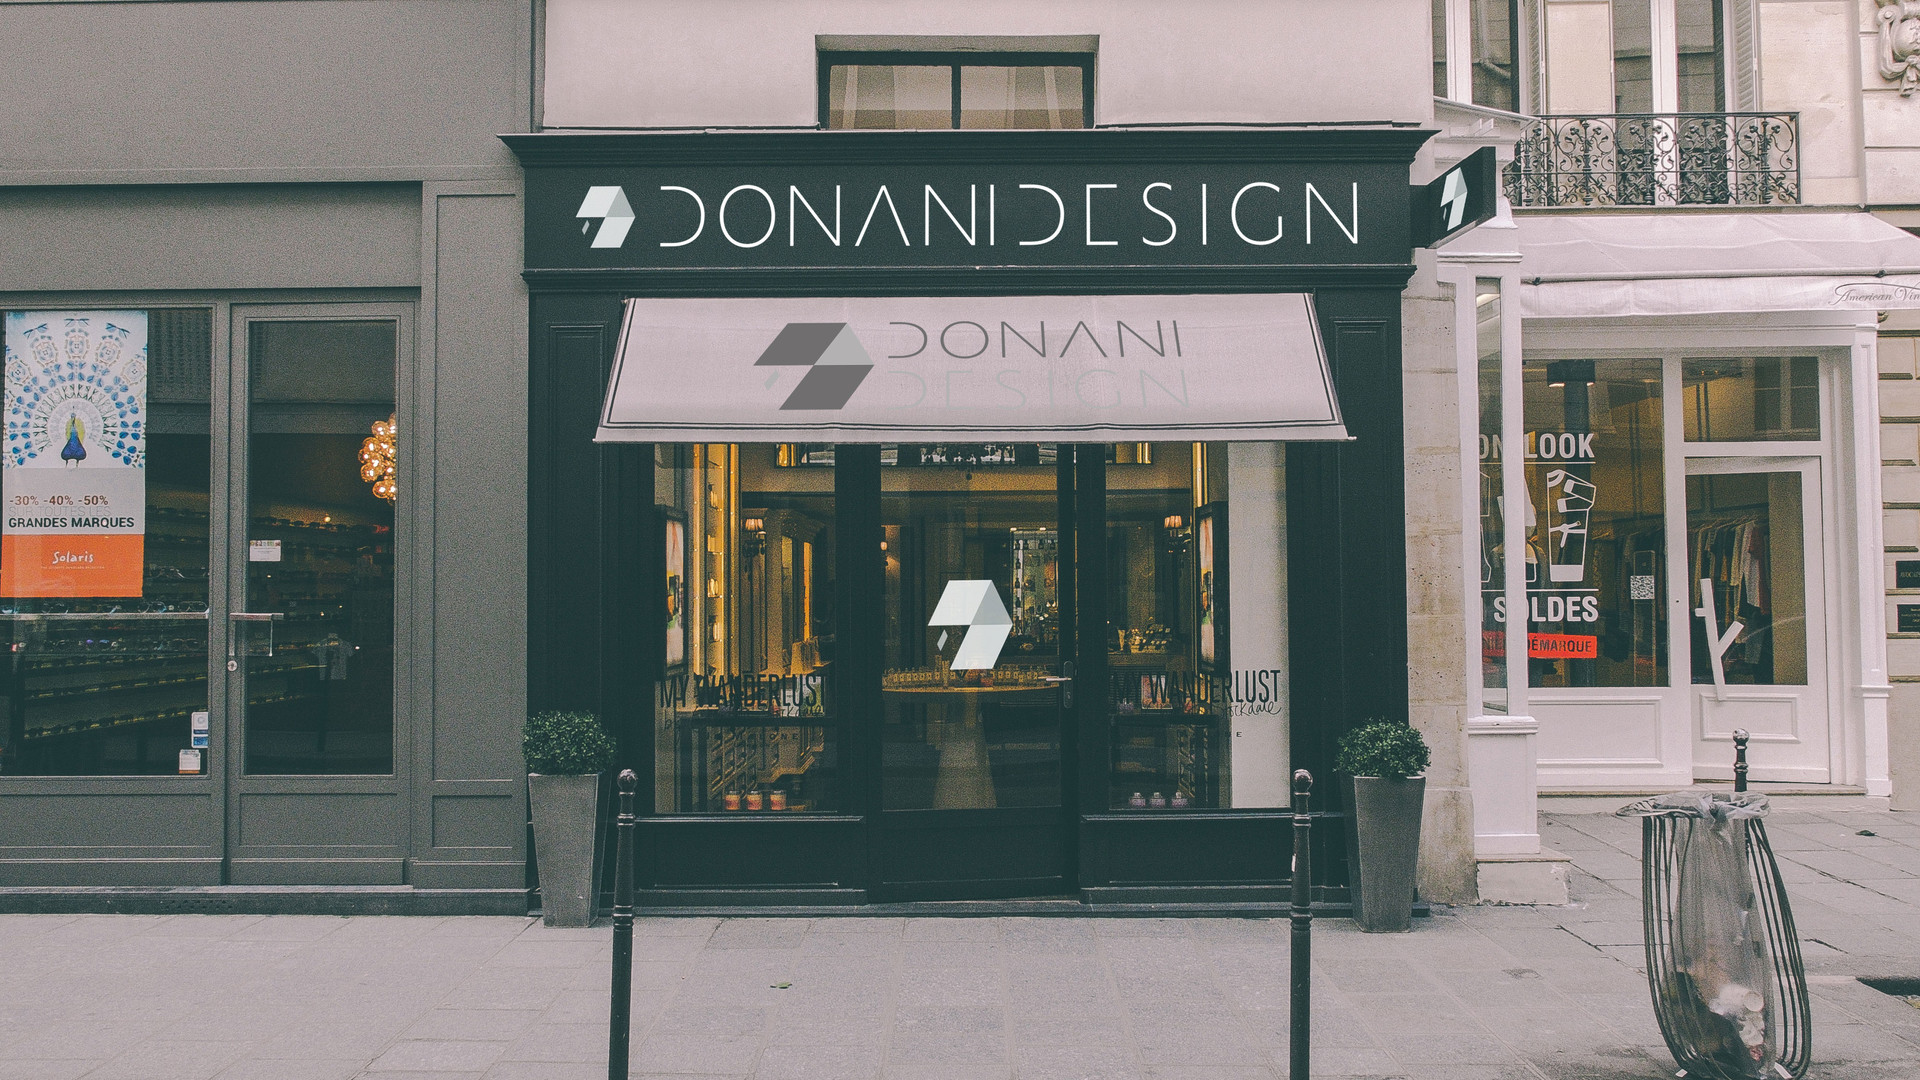 Donani Design Office